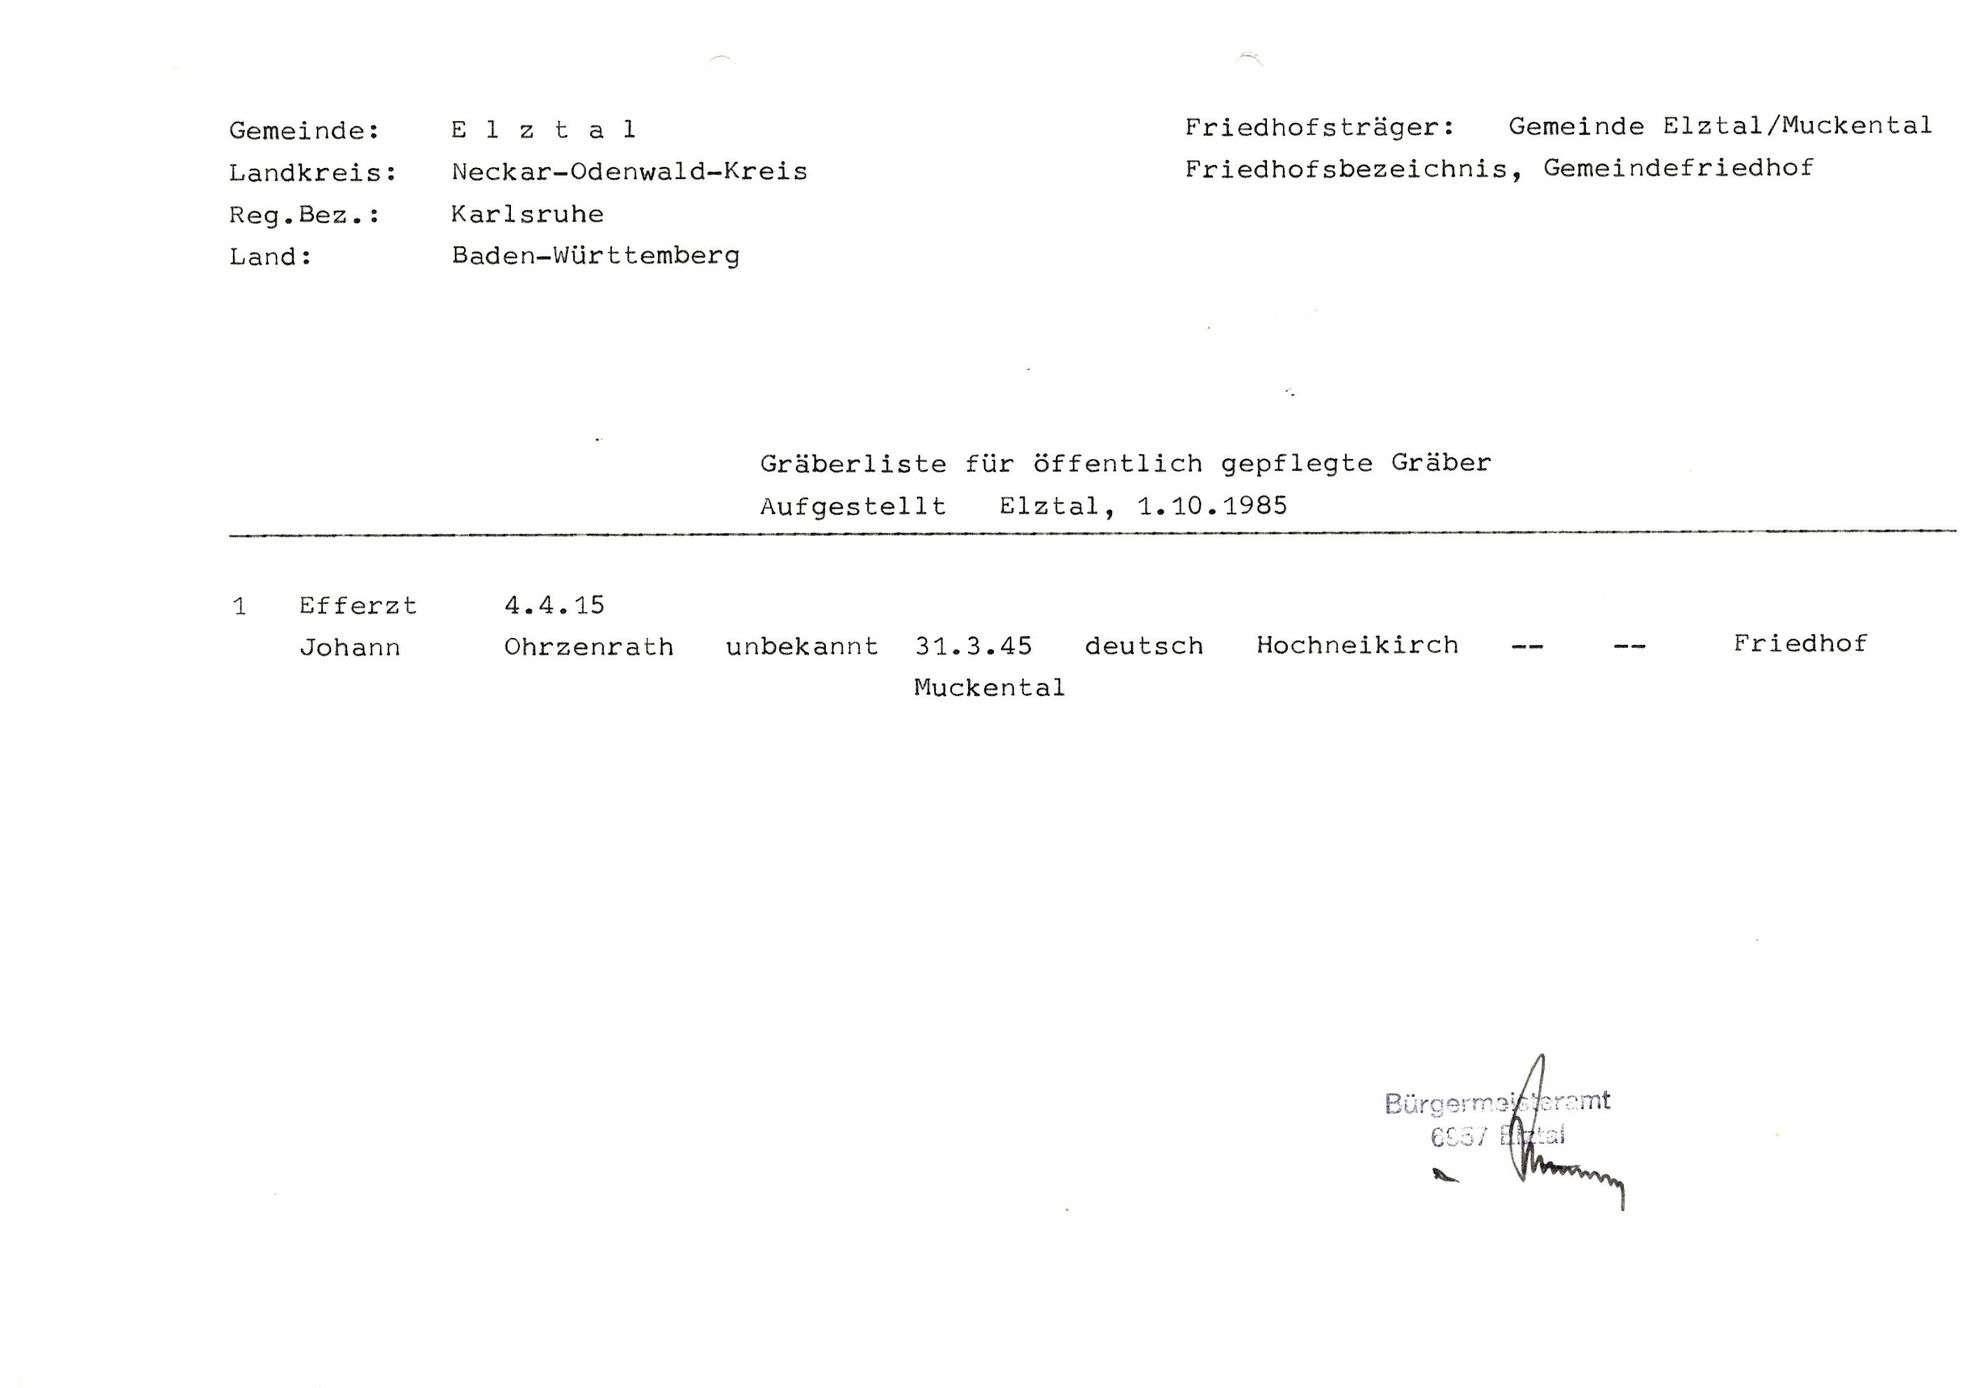 Muckental, Bild 1